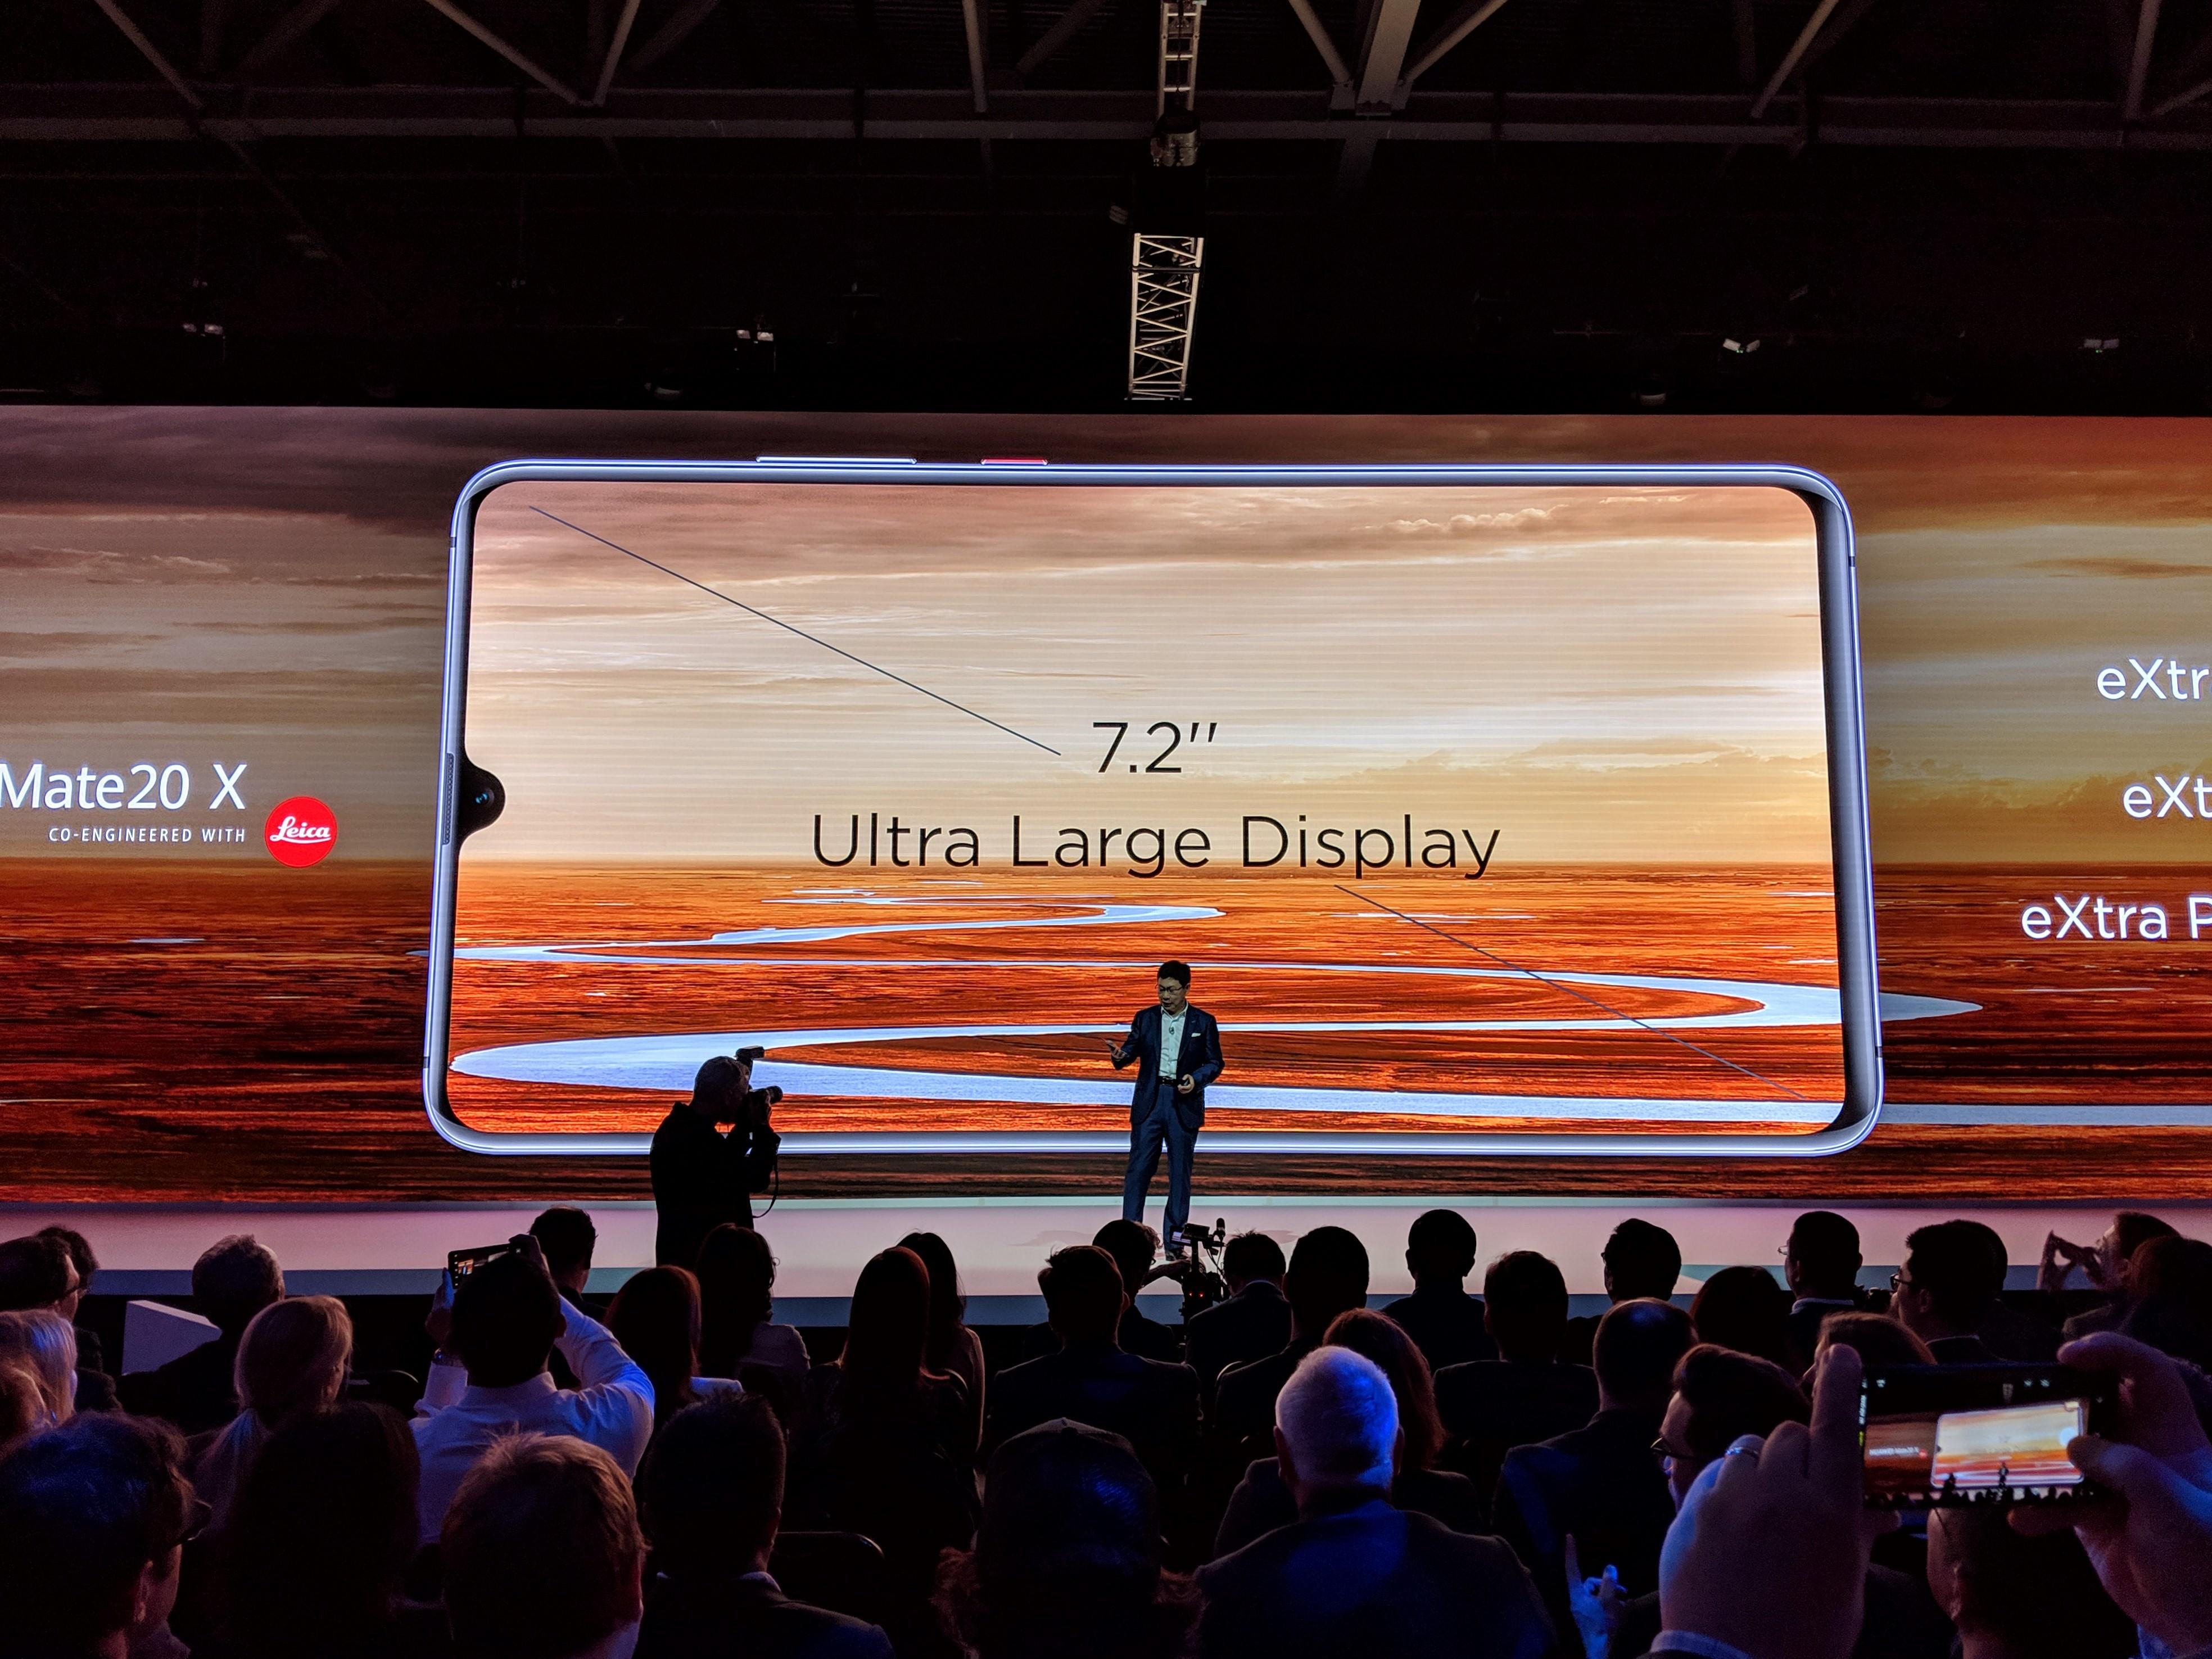 Huawei announces 7.2-inch Mate 20 X